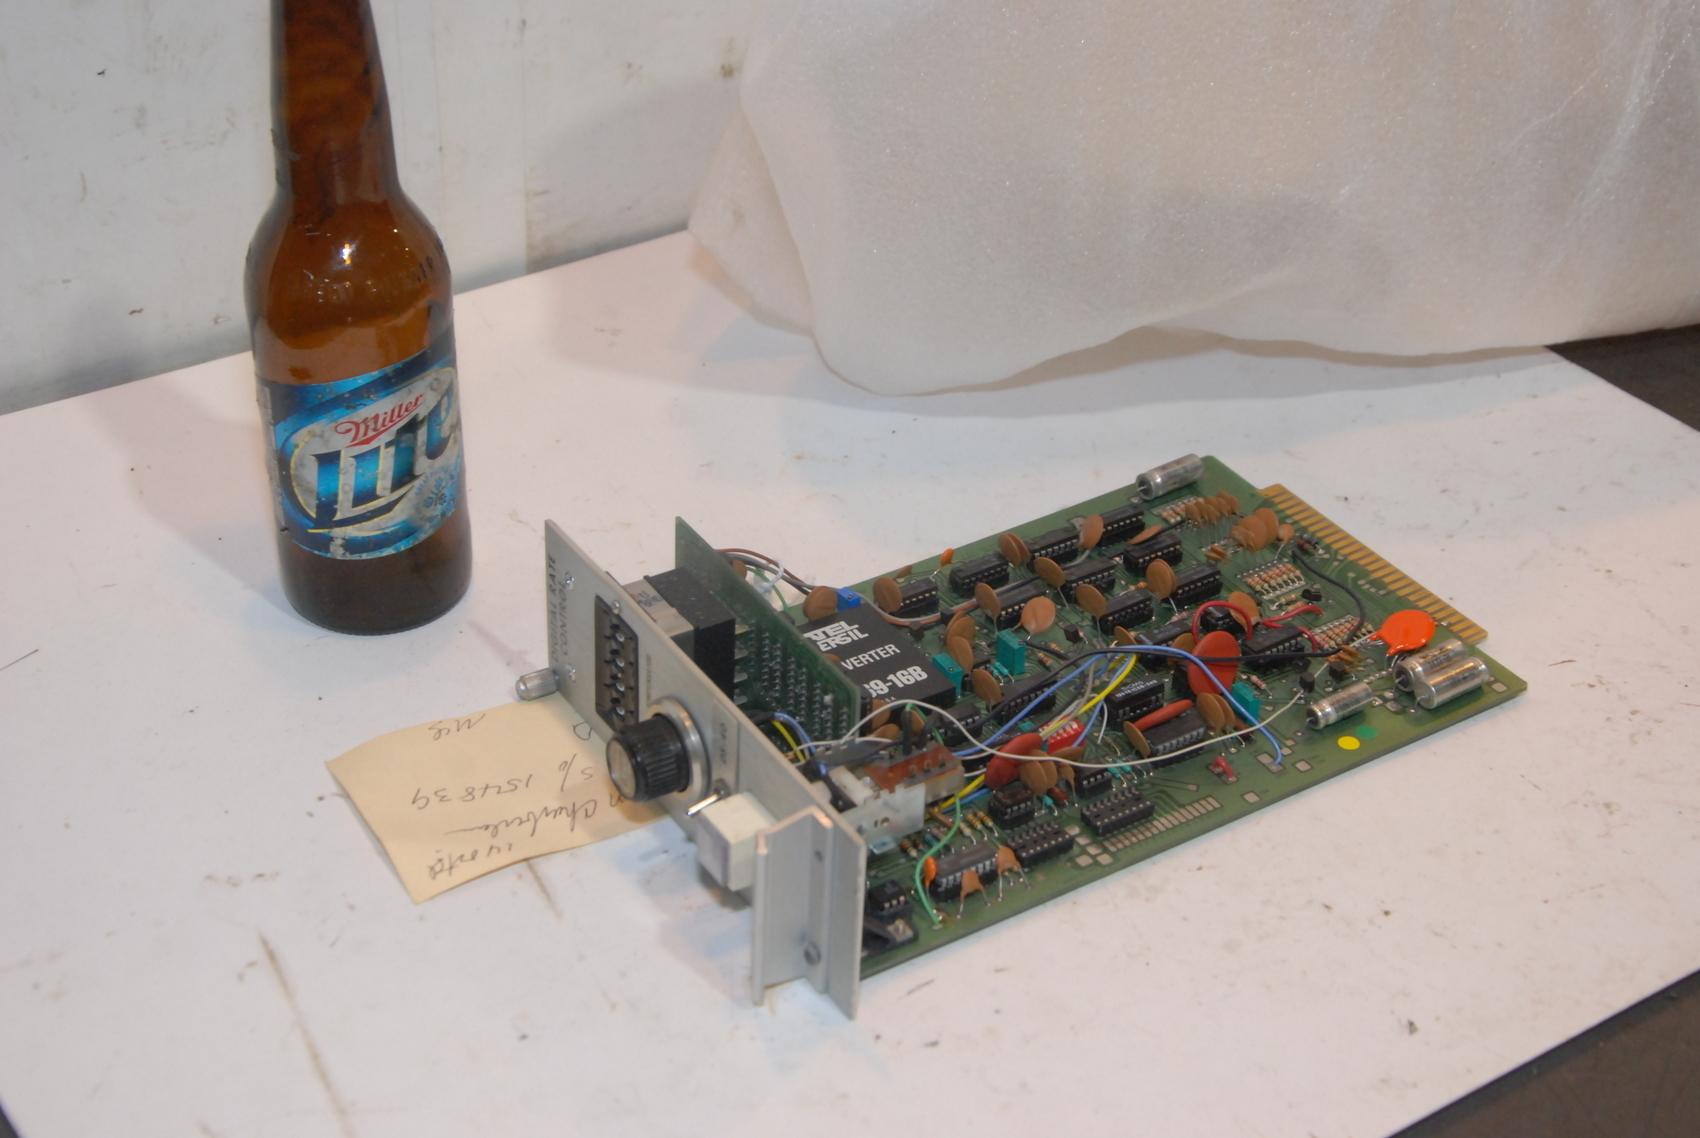 TINIUS OLSEN Model 4103-378A Digital Rate Control Unit